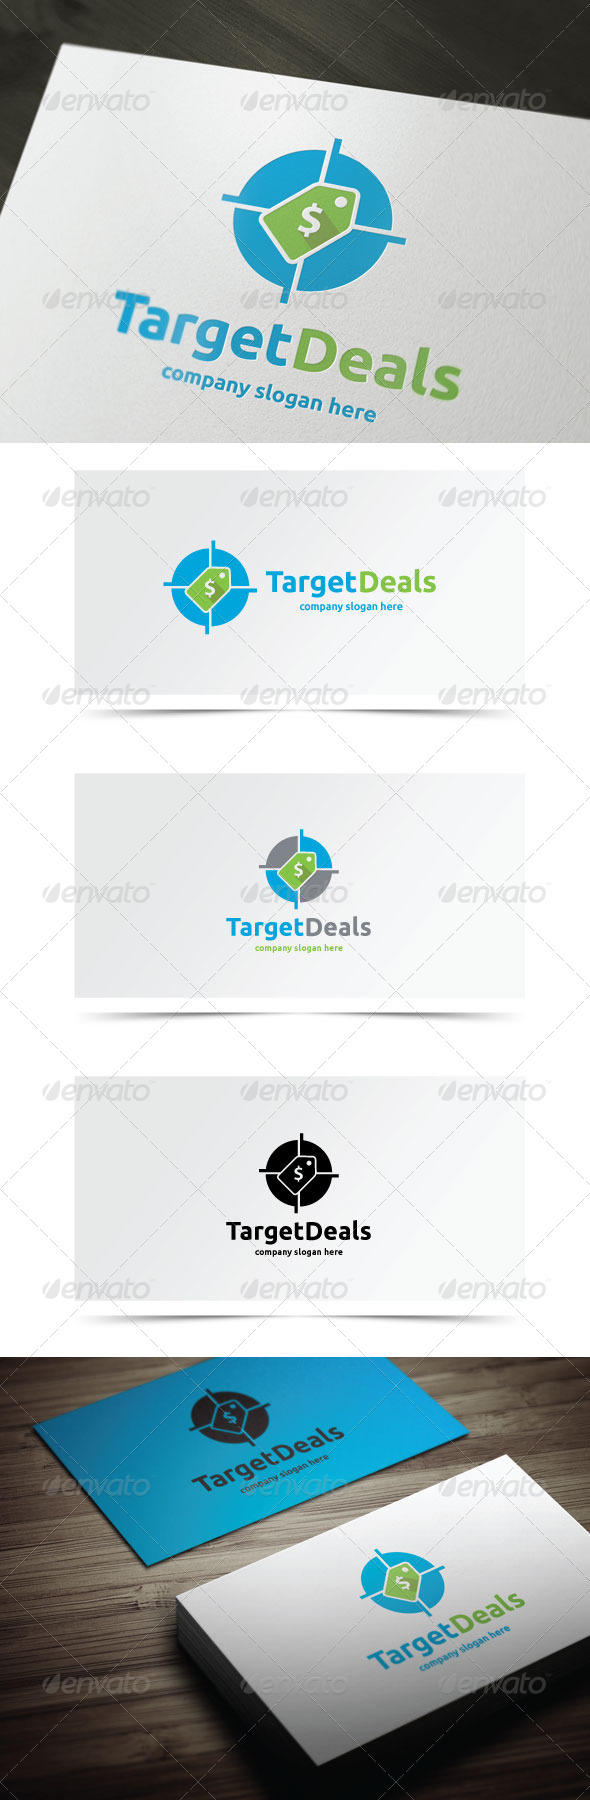 GraphicRiver Target Deals 8512203